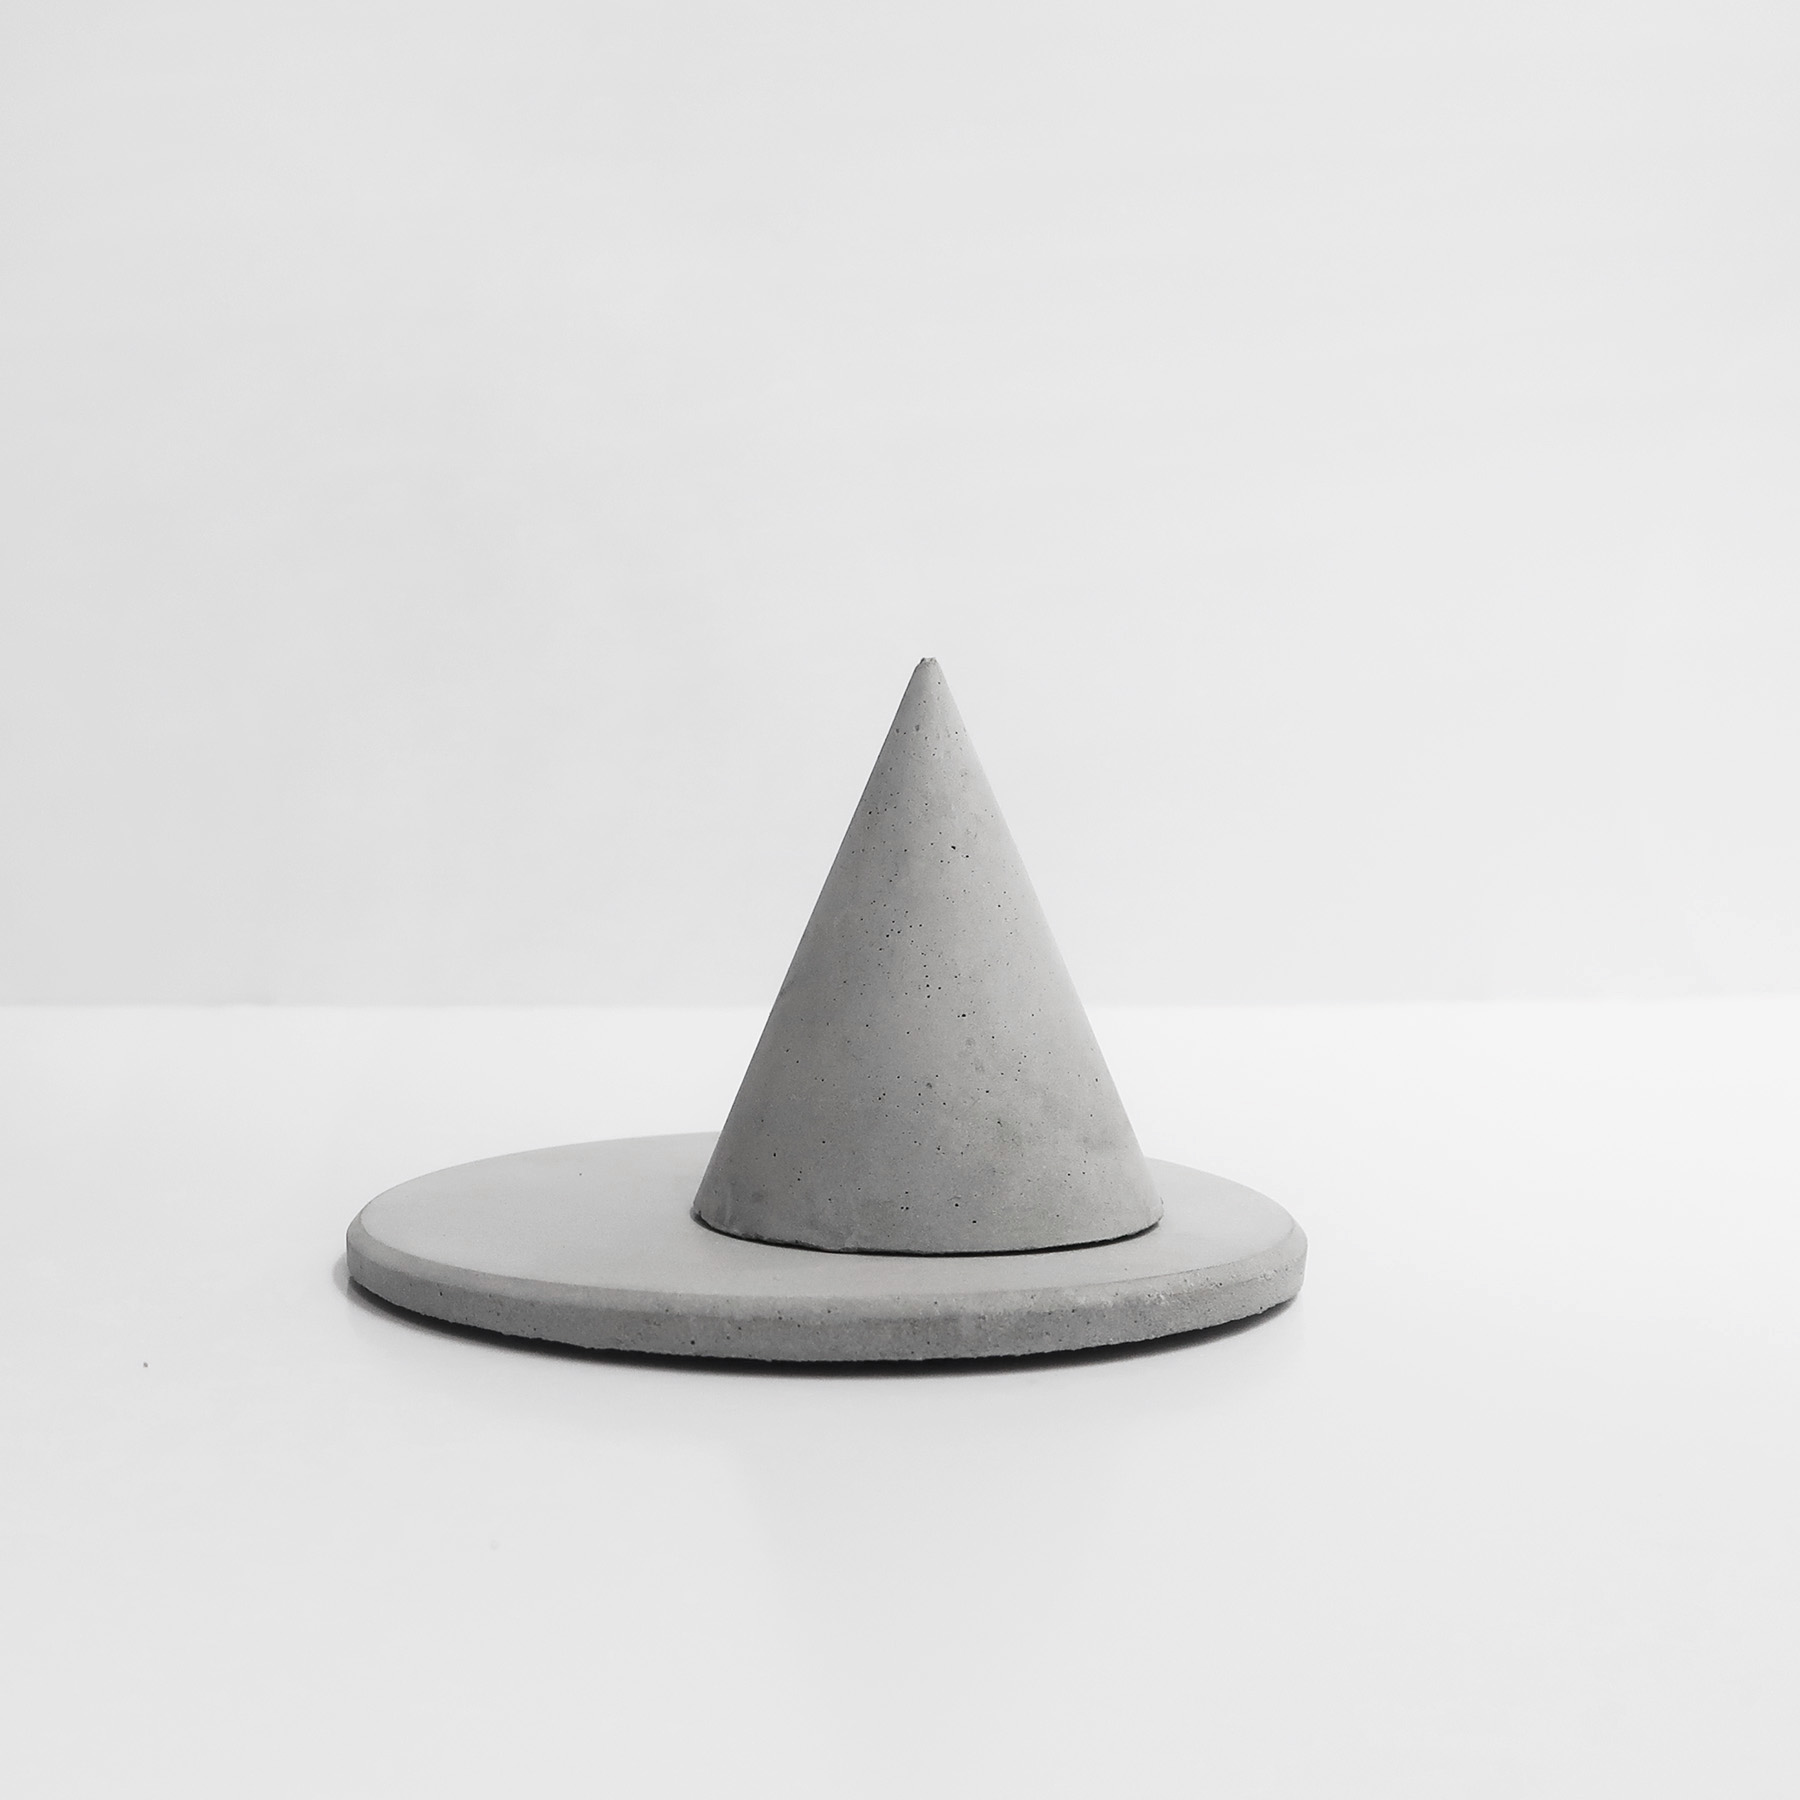 HILL FOG小山霧戒指座飾品盤收納組 / Concrete ring holder + trinket dish